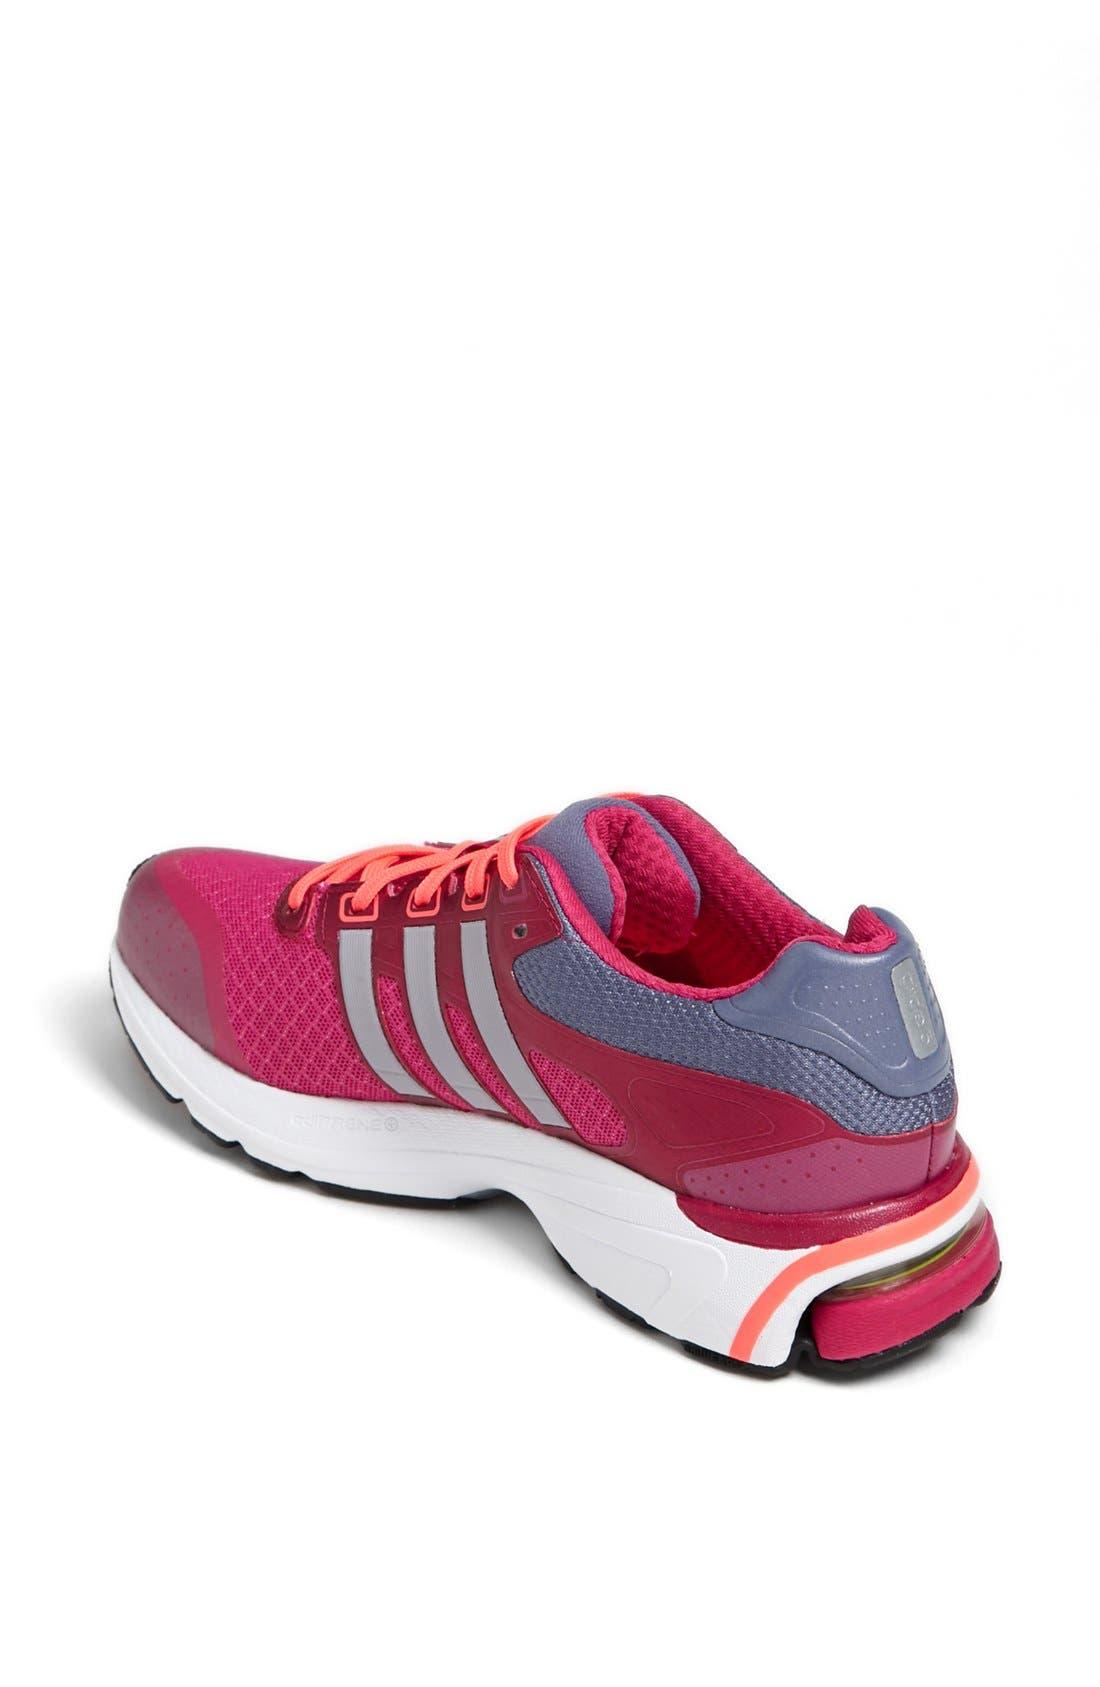 Alternate Image 2  - adidas 'Supernova Glide 5' Running Shoe (Women)